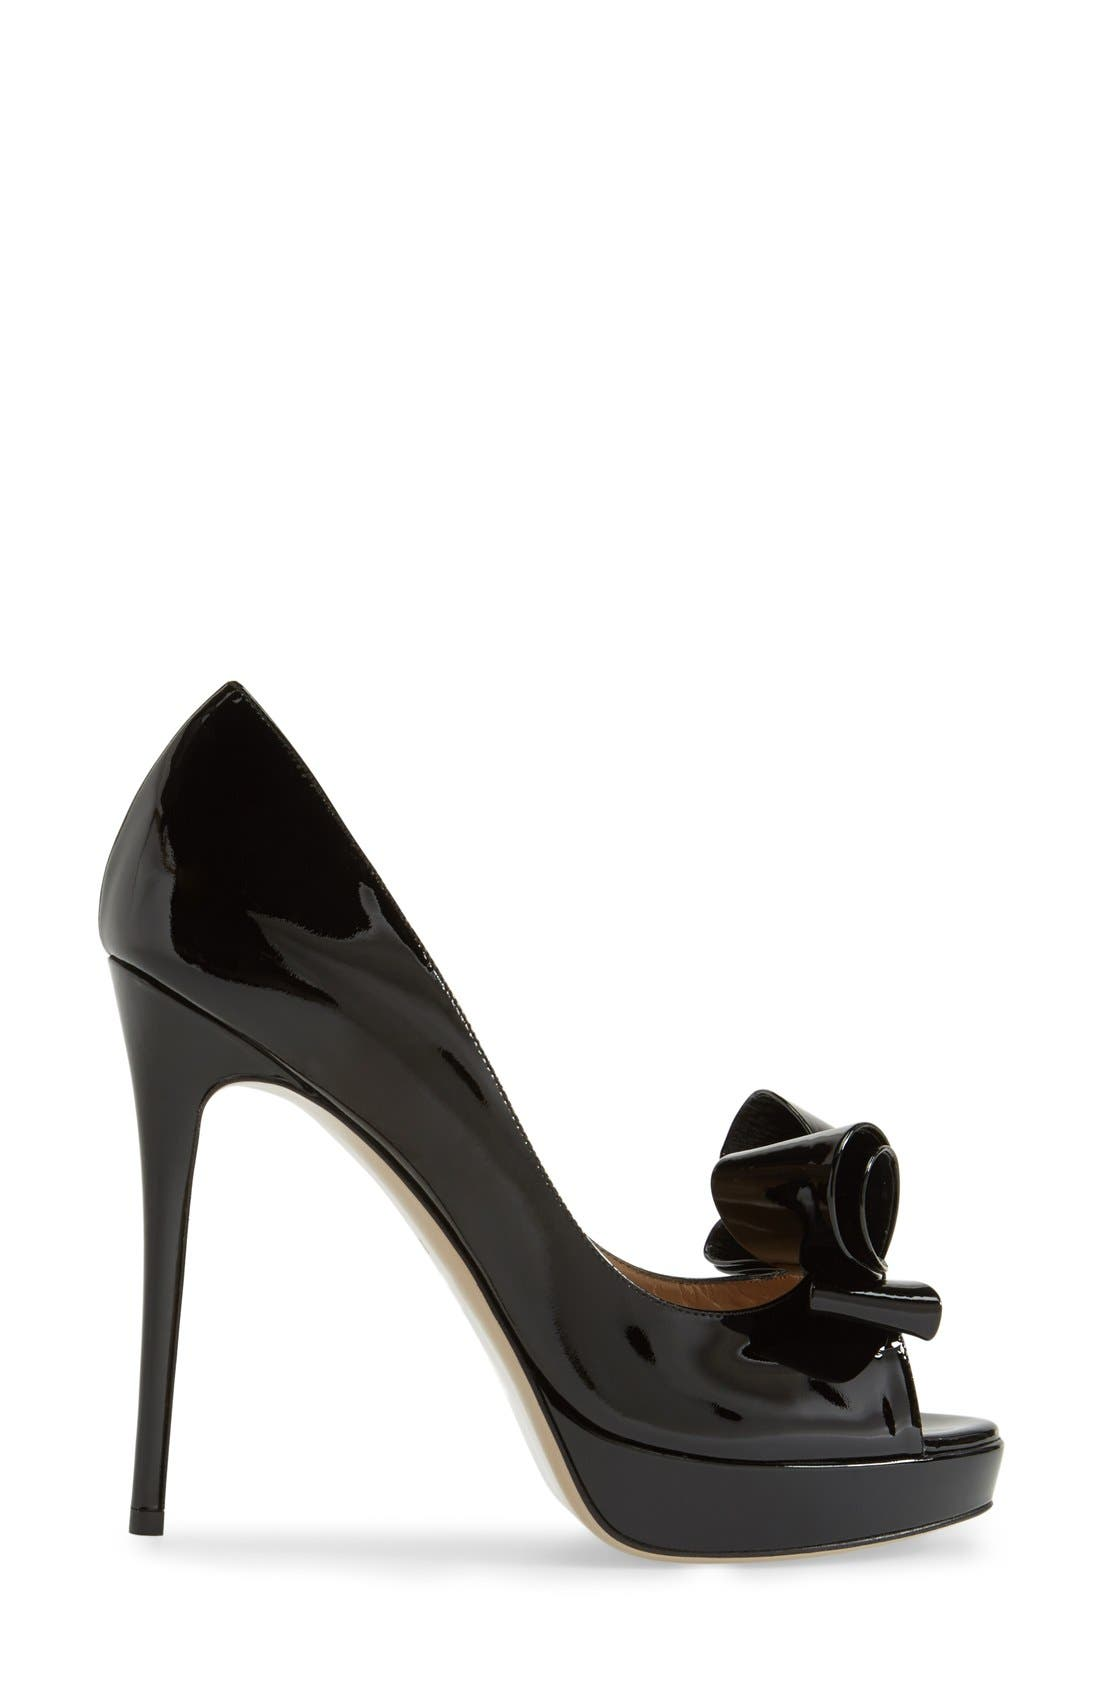 VALENTINO GARAVANI,                             Couture Bow Platform Pump,                             Alternate thumbnail 2, color,                             001